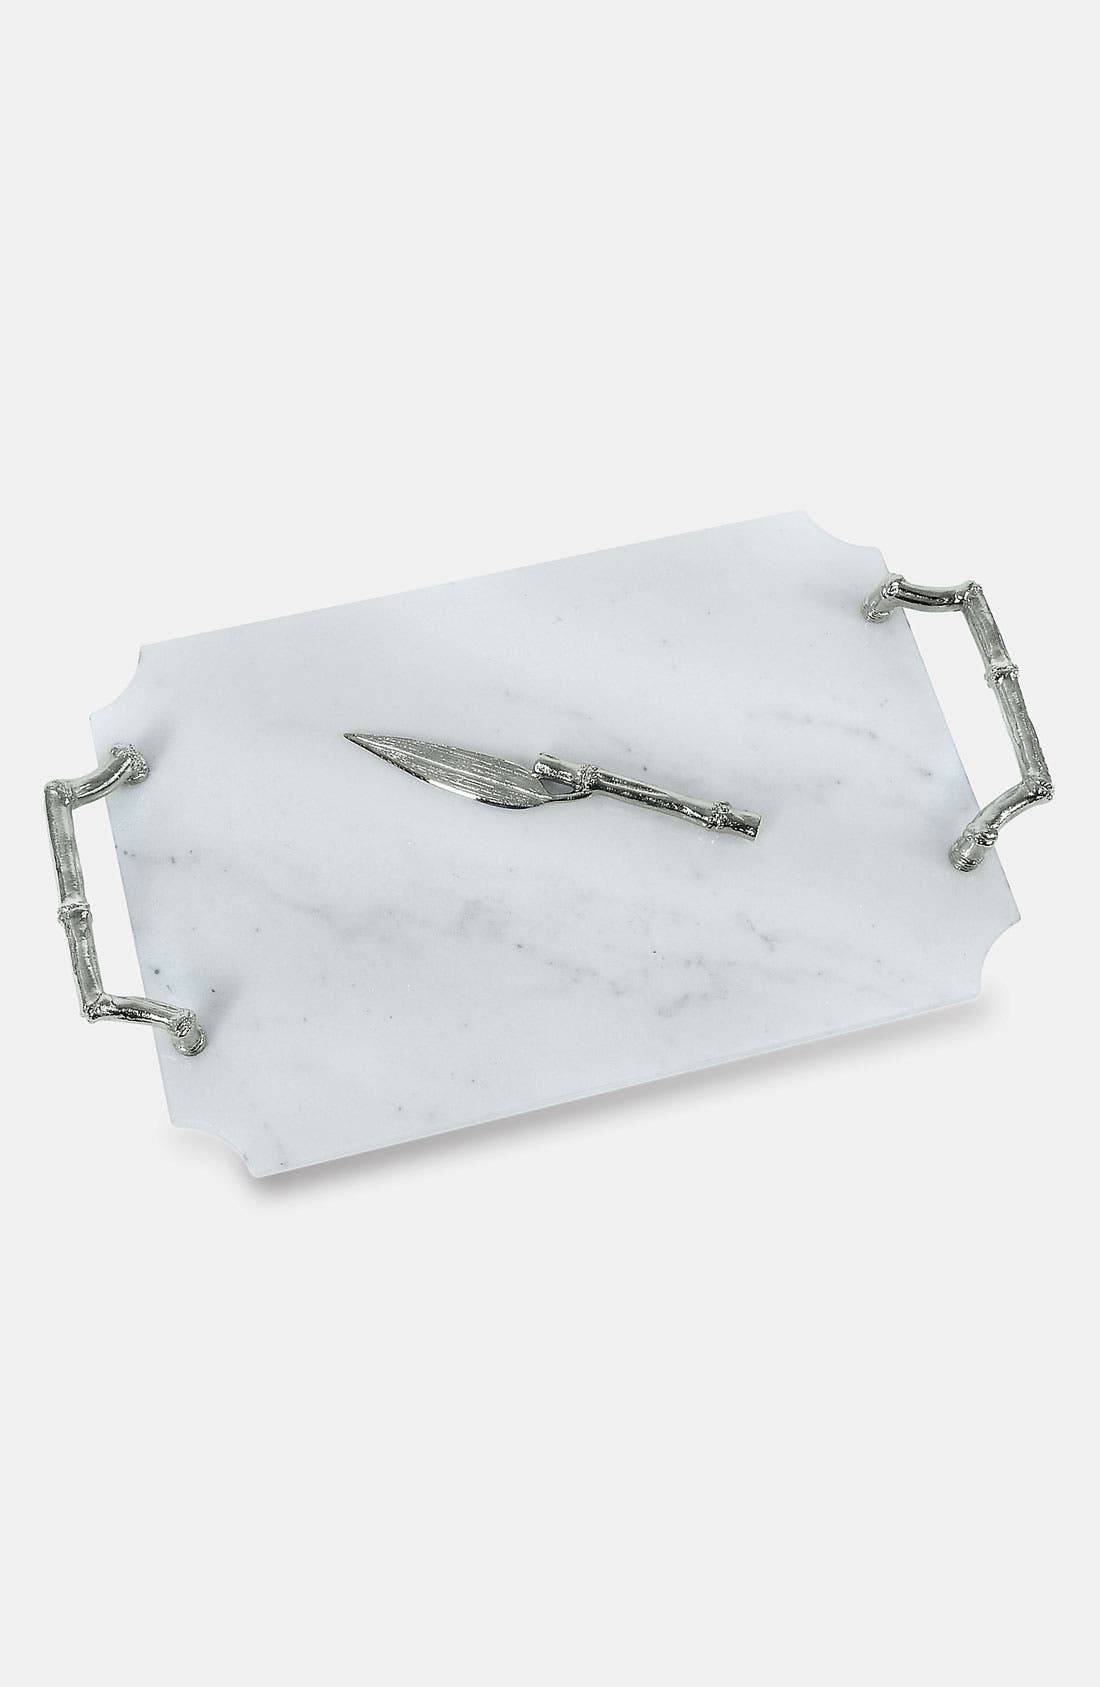 Alternate Image 1 Selected - Michael Aram 'Bamboo' Cheese Board & Knife